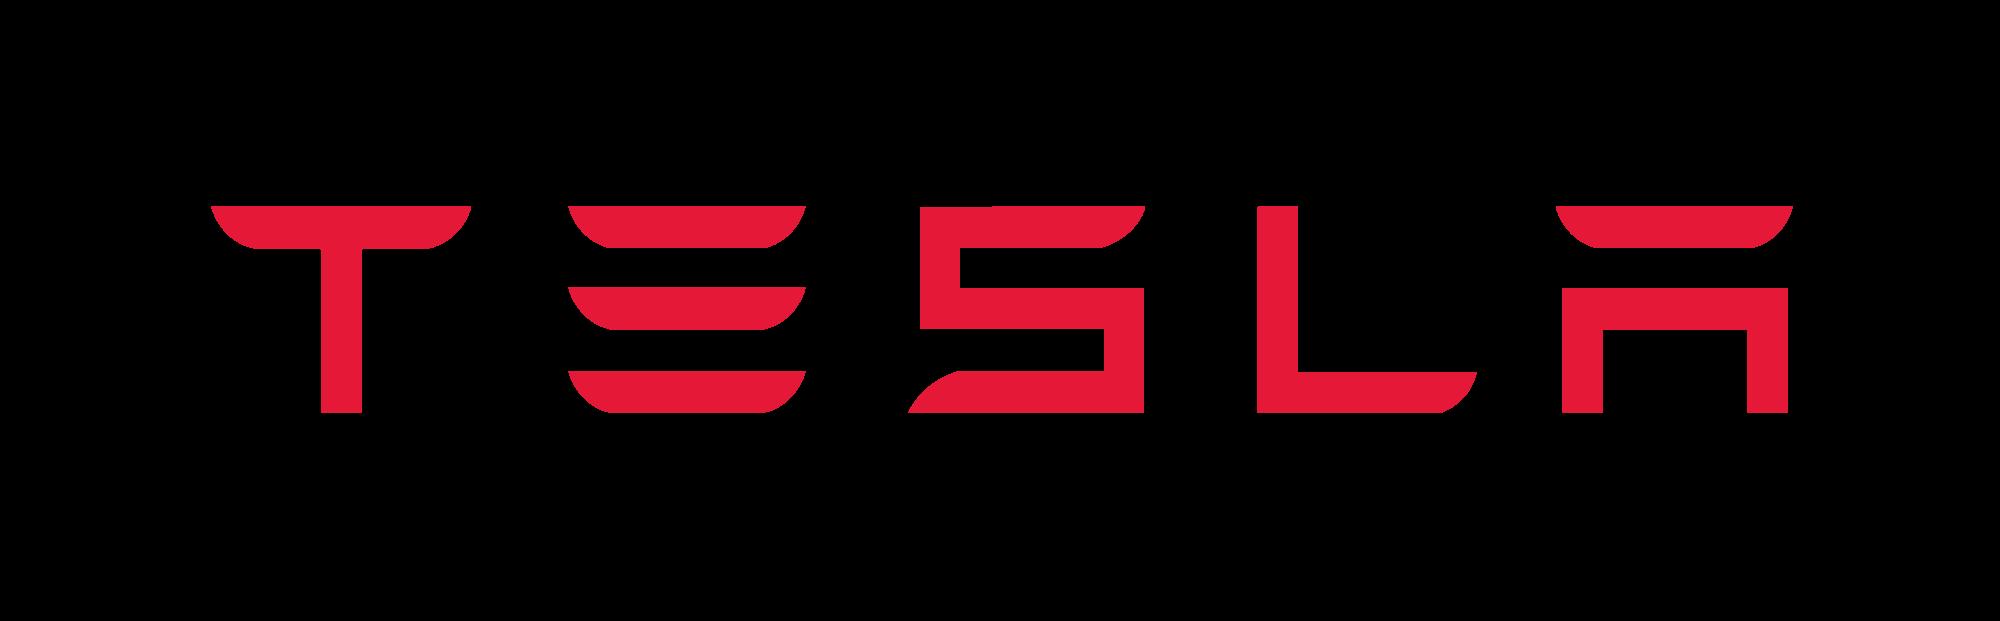 Tesla Skirts Michigan Dealership Law   DMV.ORG